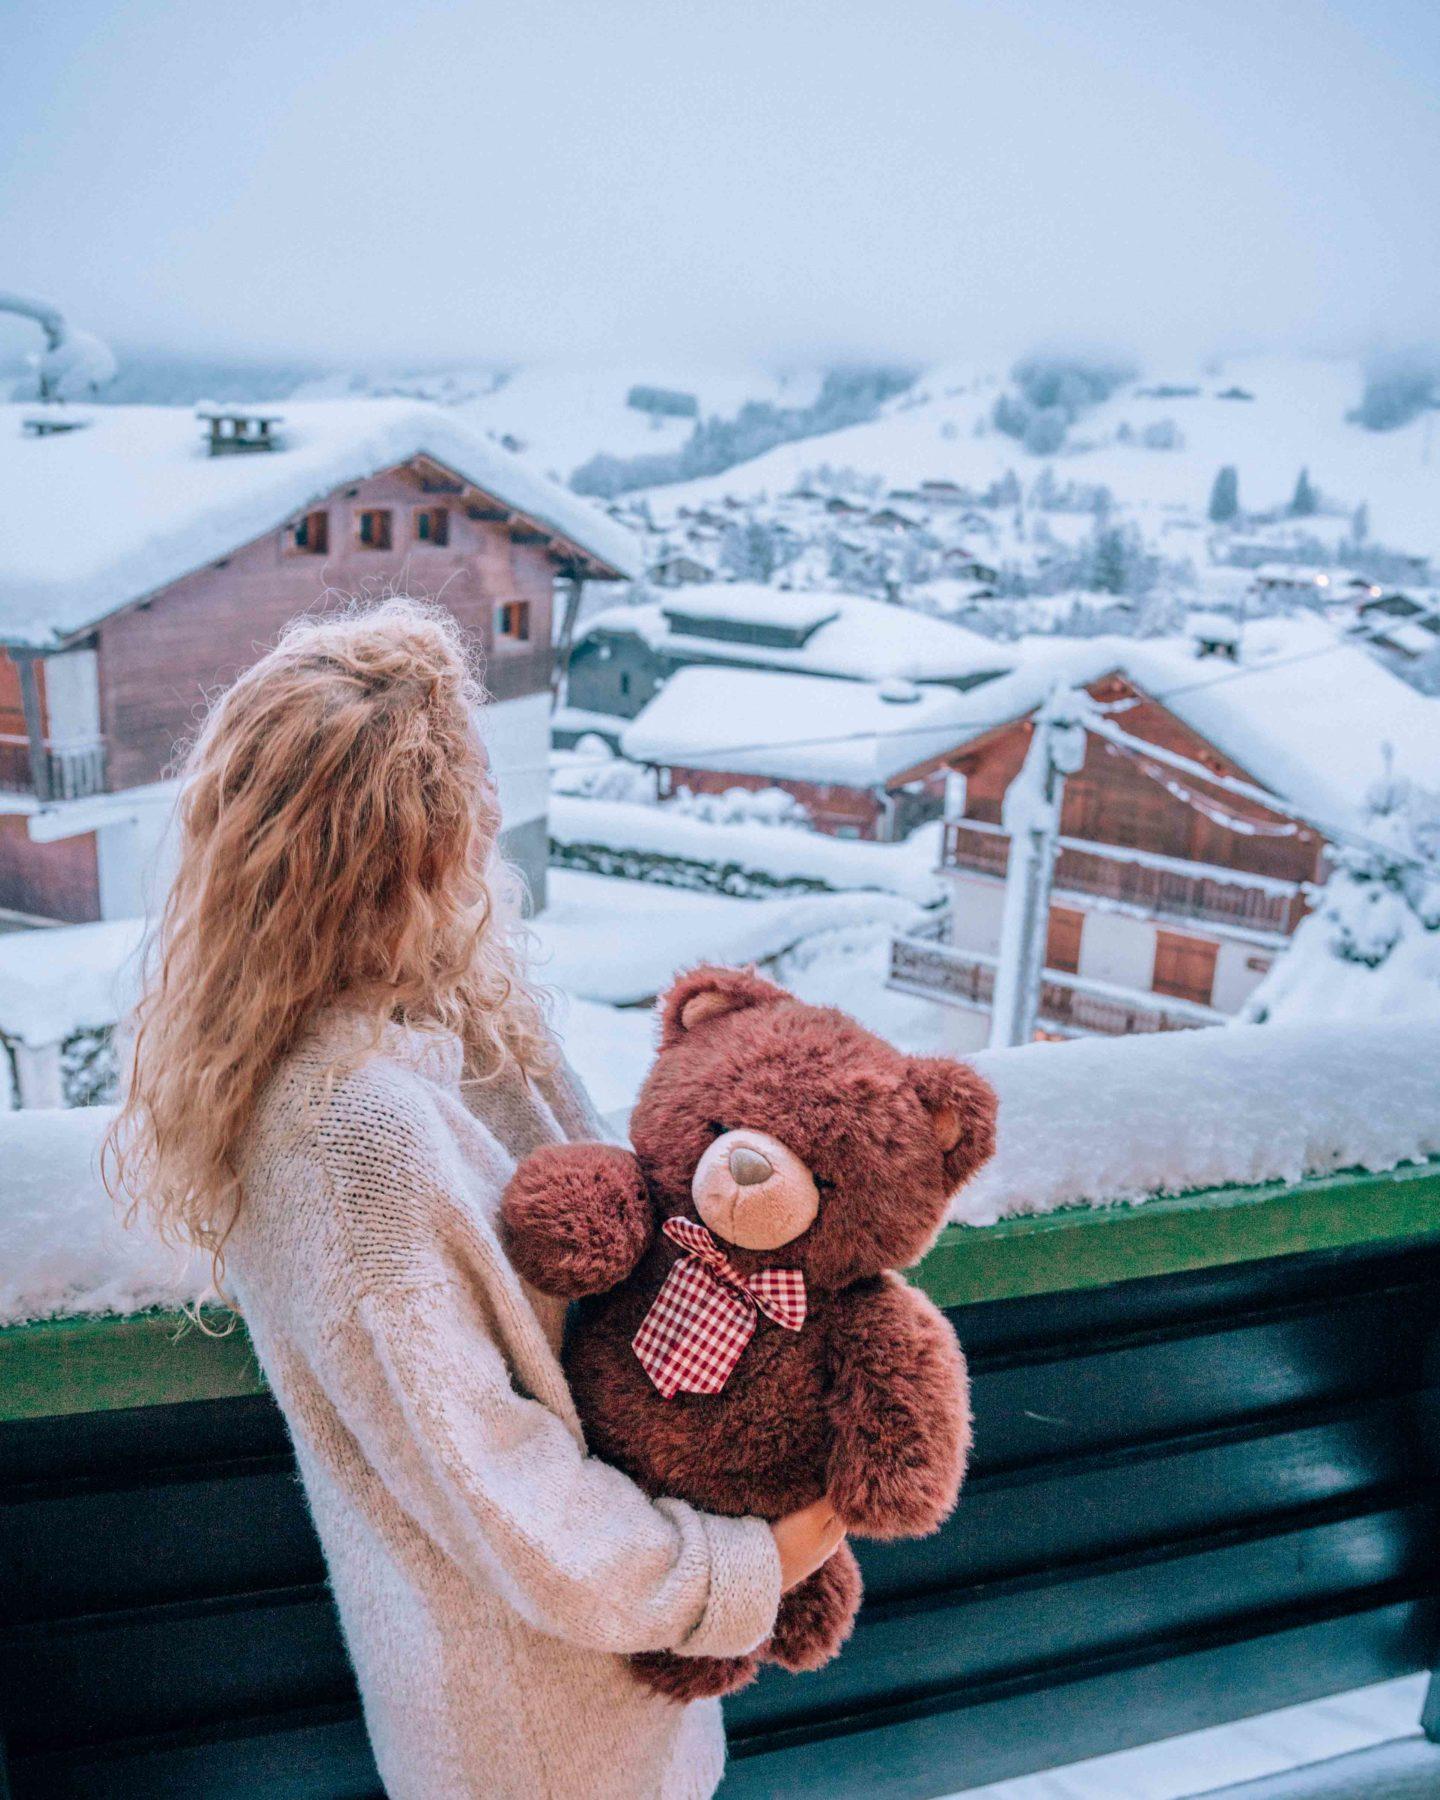 Teddy bear and mountain views